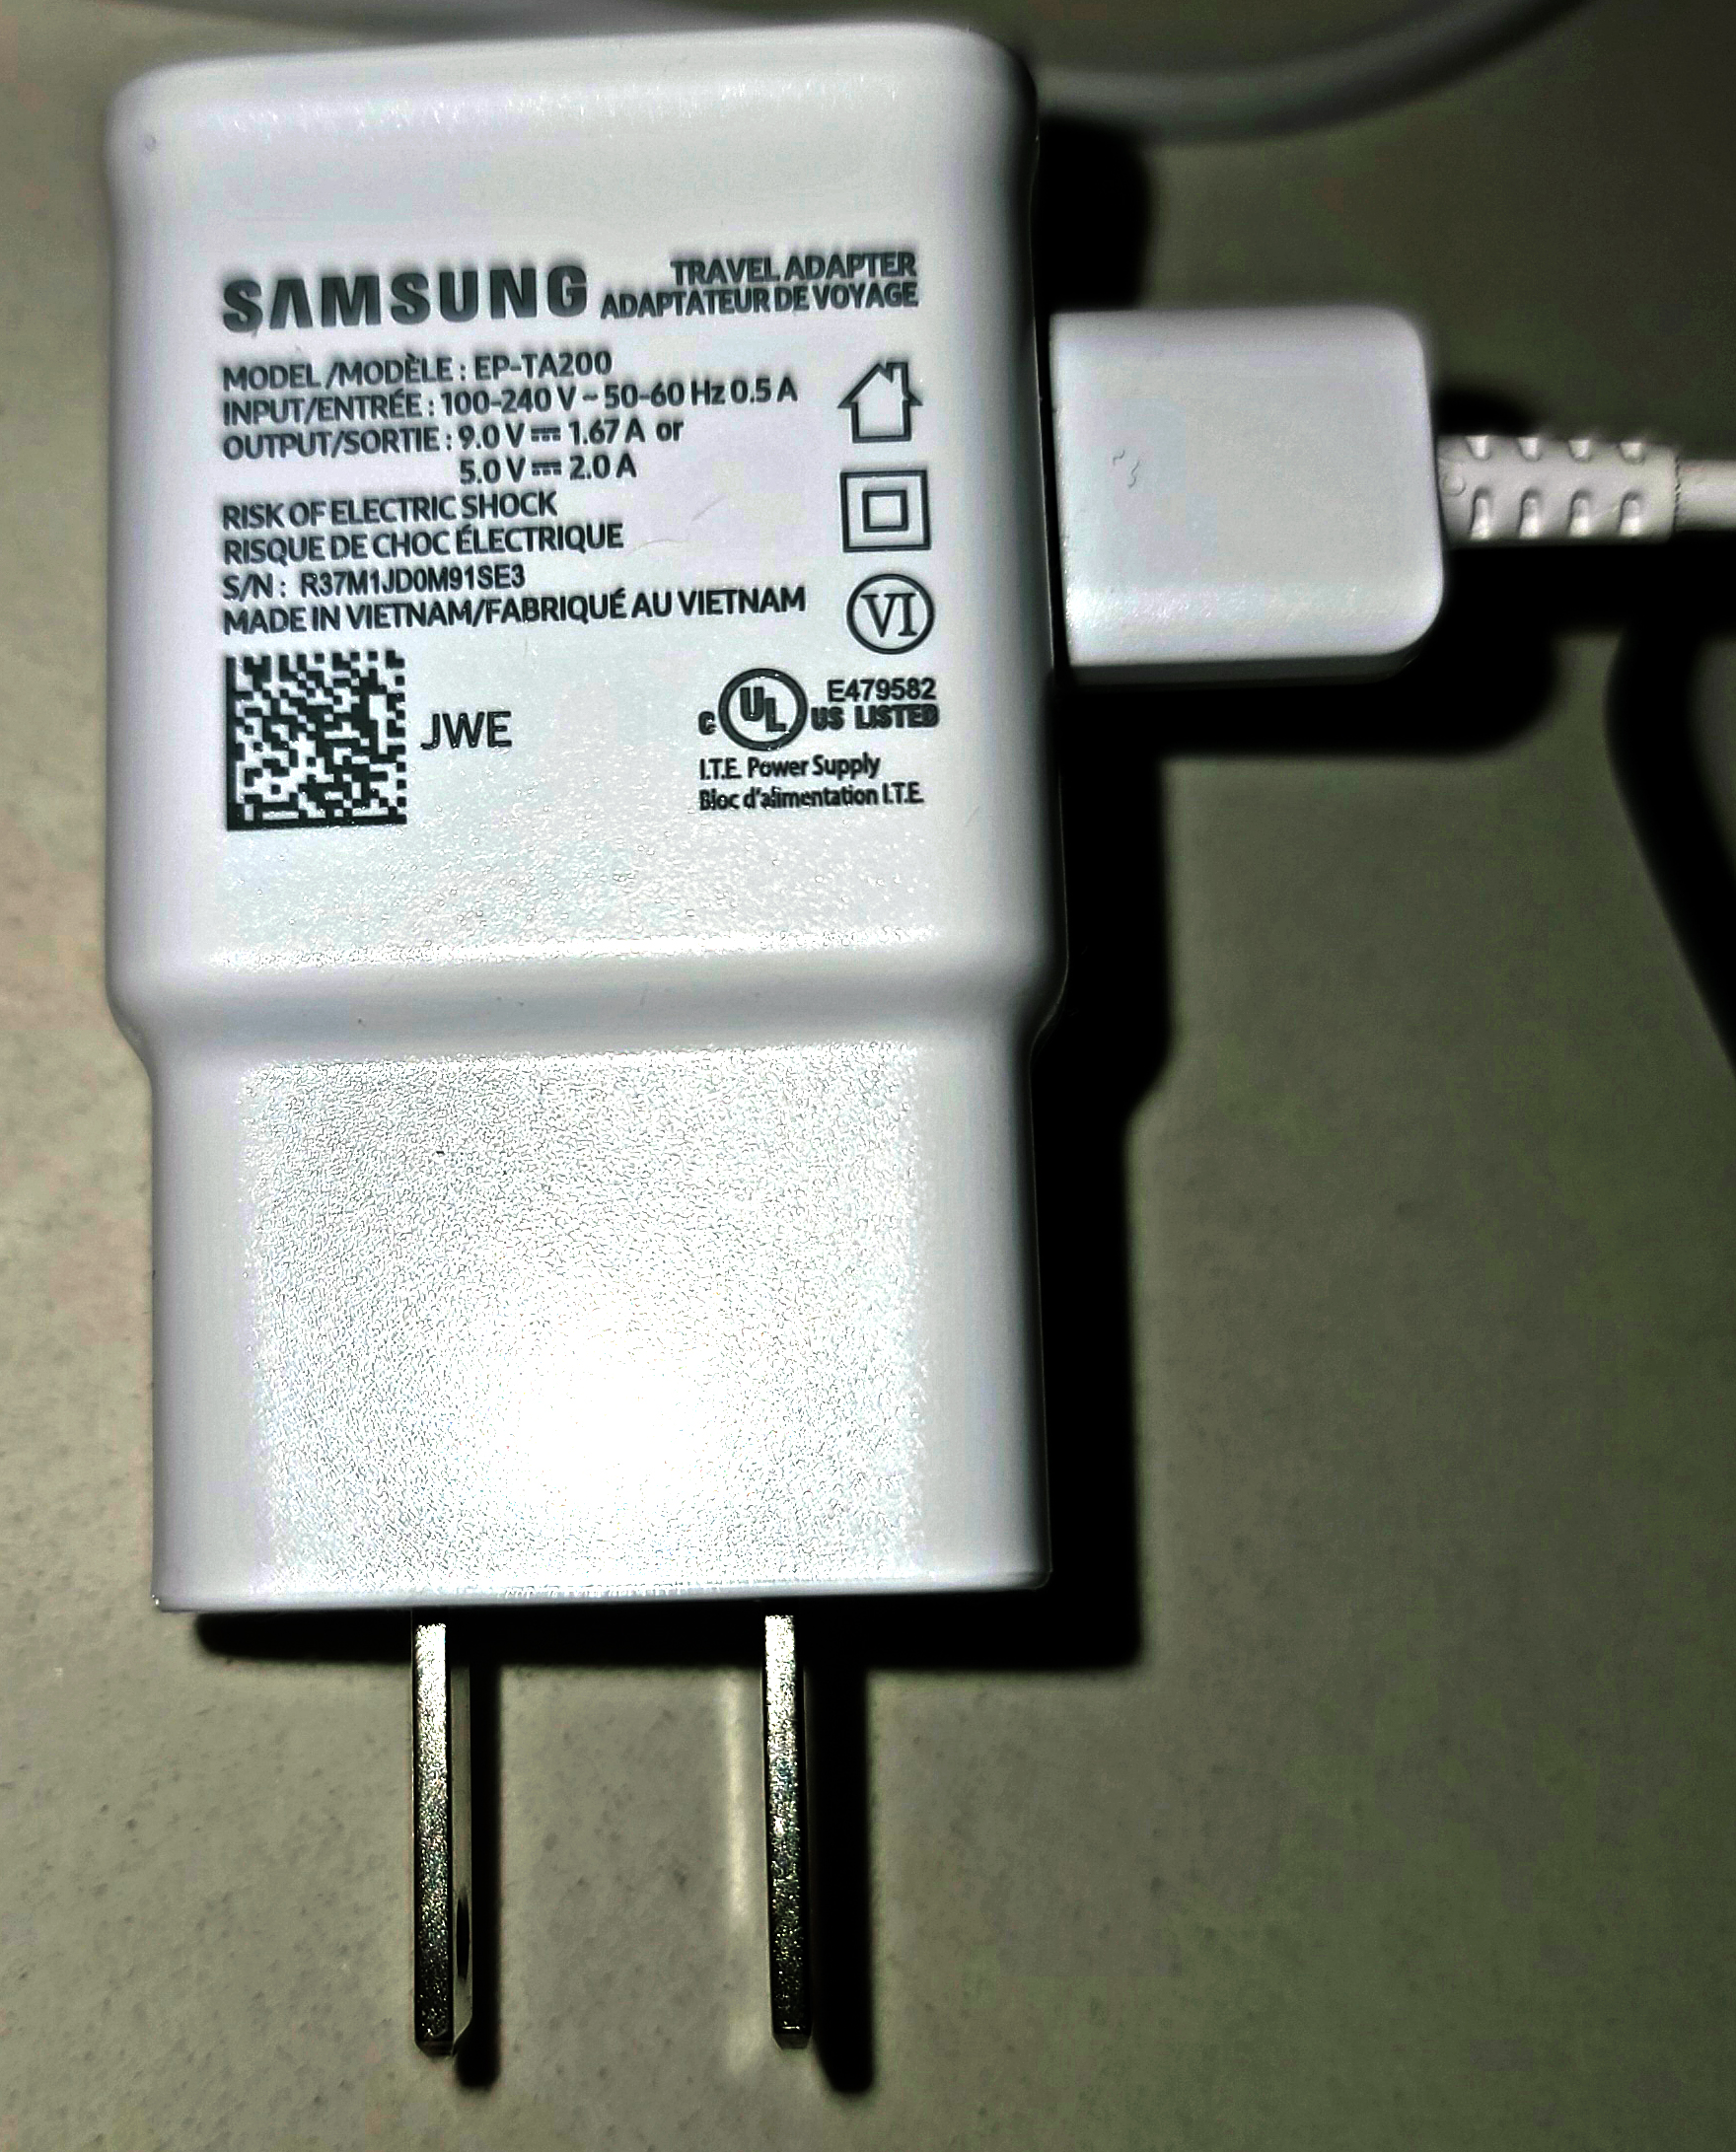 Samsung Charger I Use  2021-01-13 17.21.16.jpg